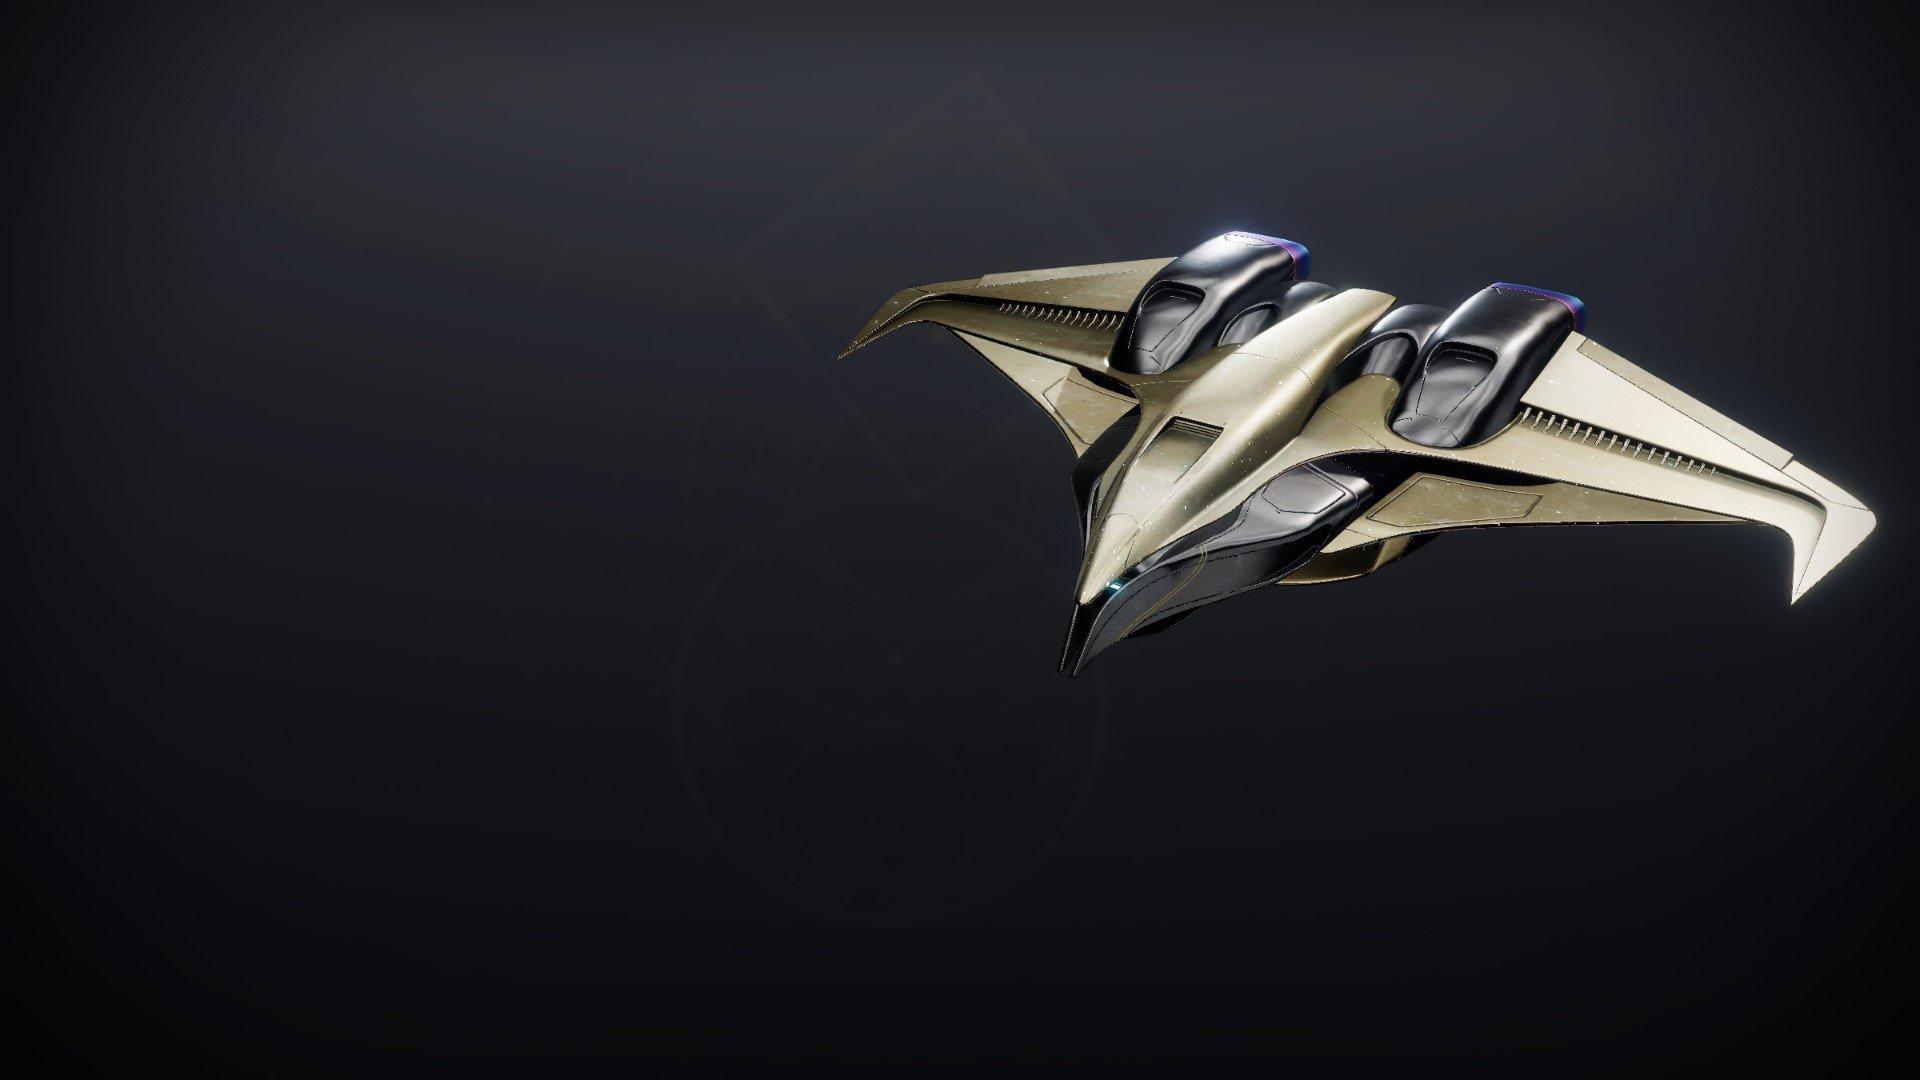 An in-game render of the Celestial Kestrel.